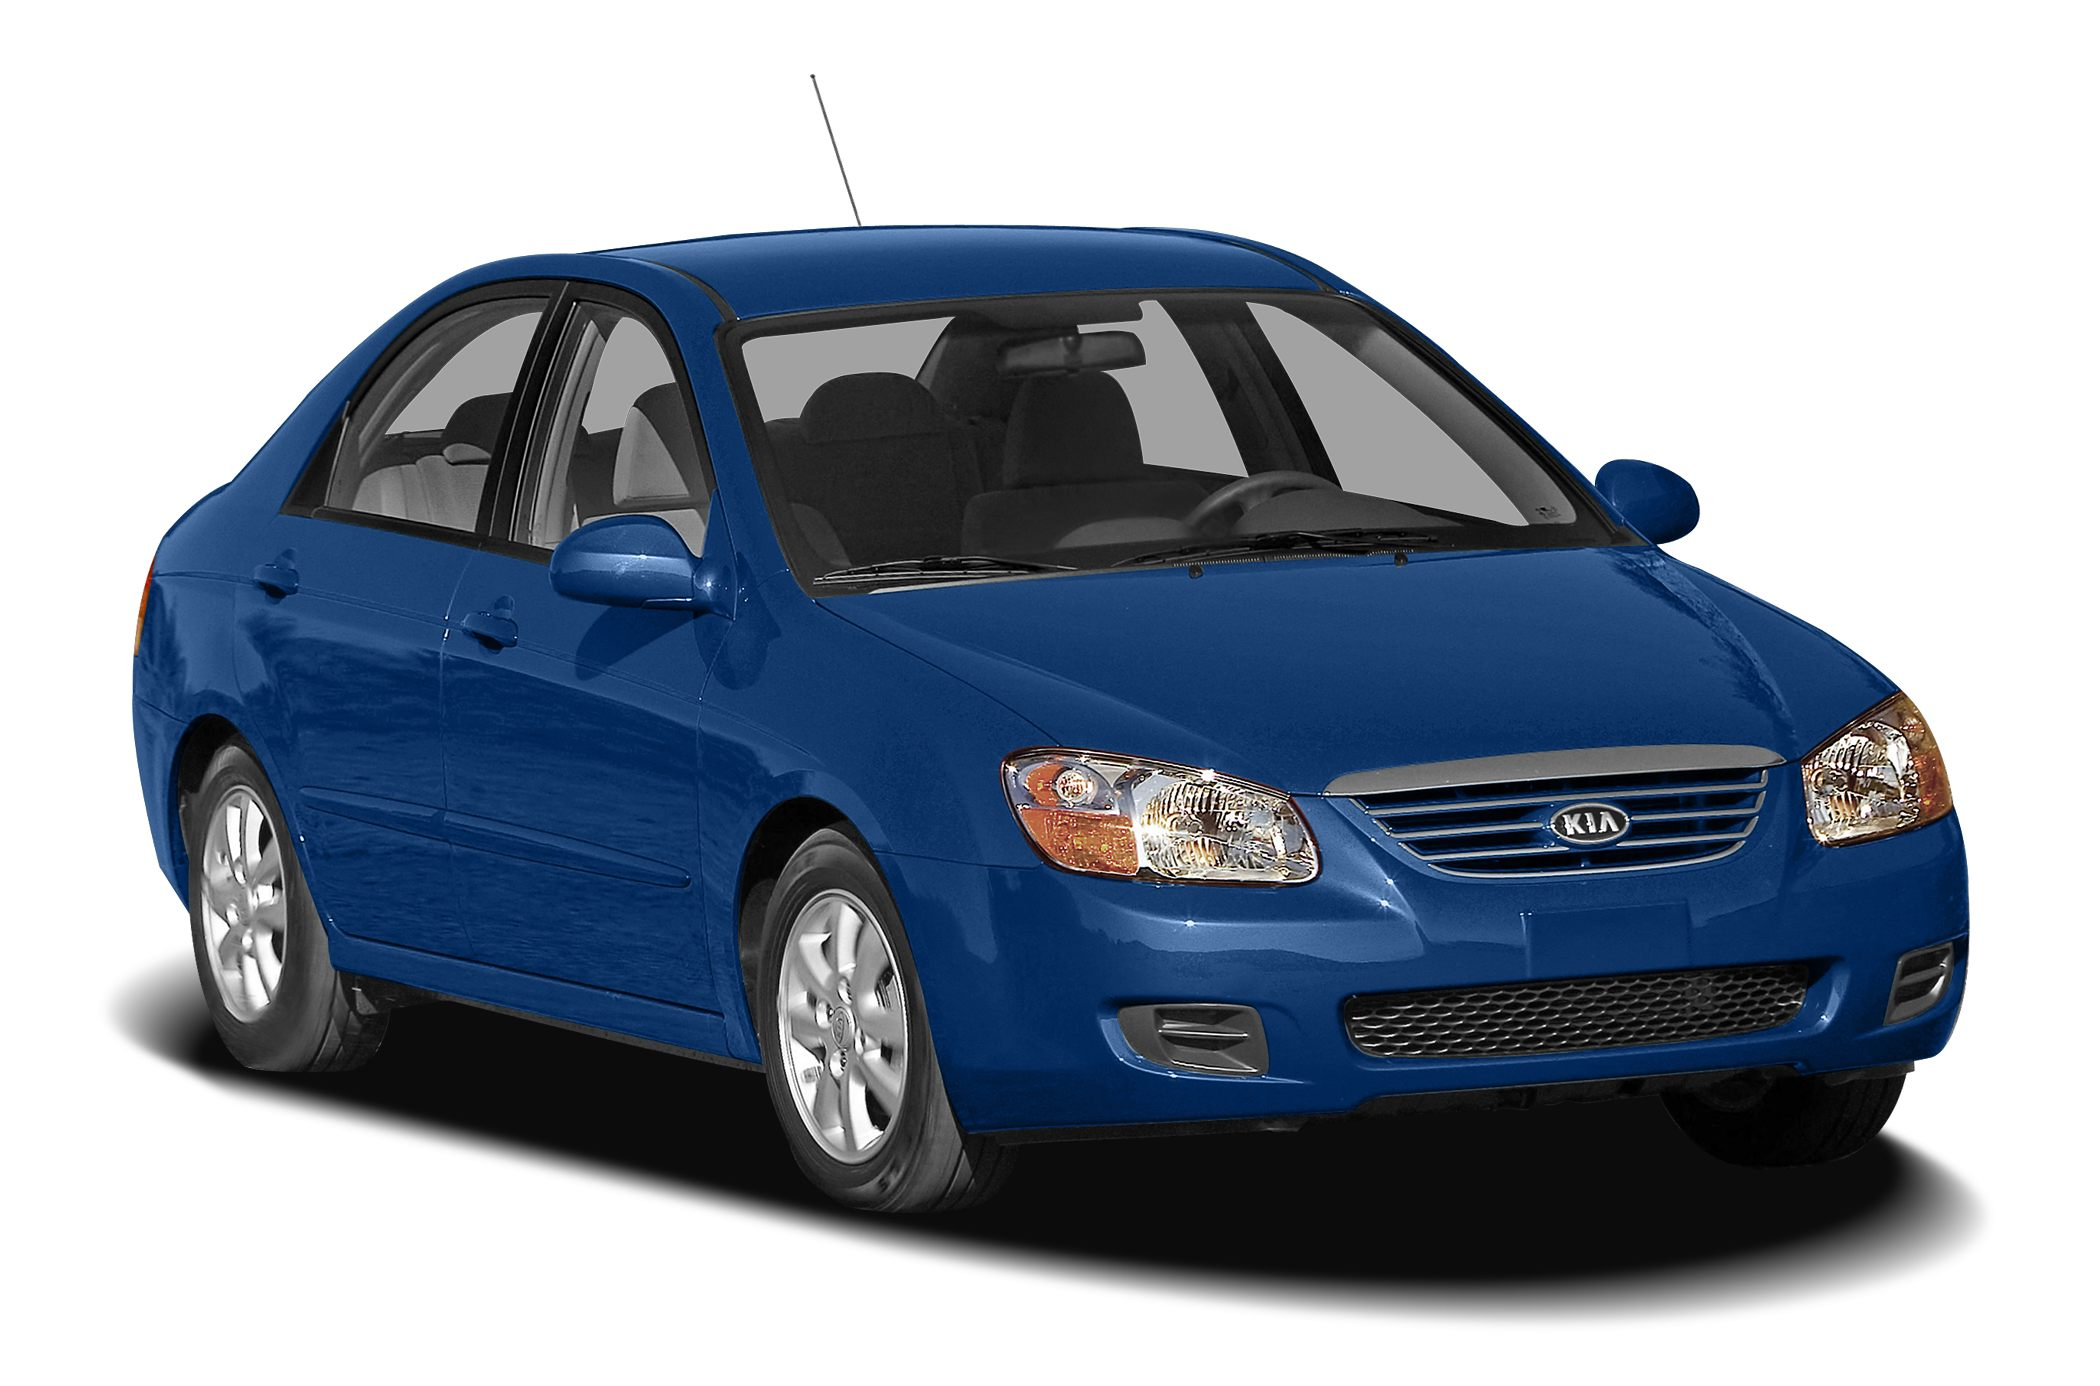 2007 Kia Spectra EX Sedan for sale in Modesto for $10,599 with 58,255 miles.